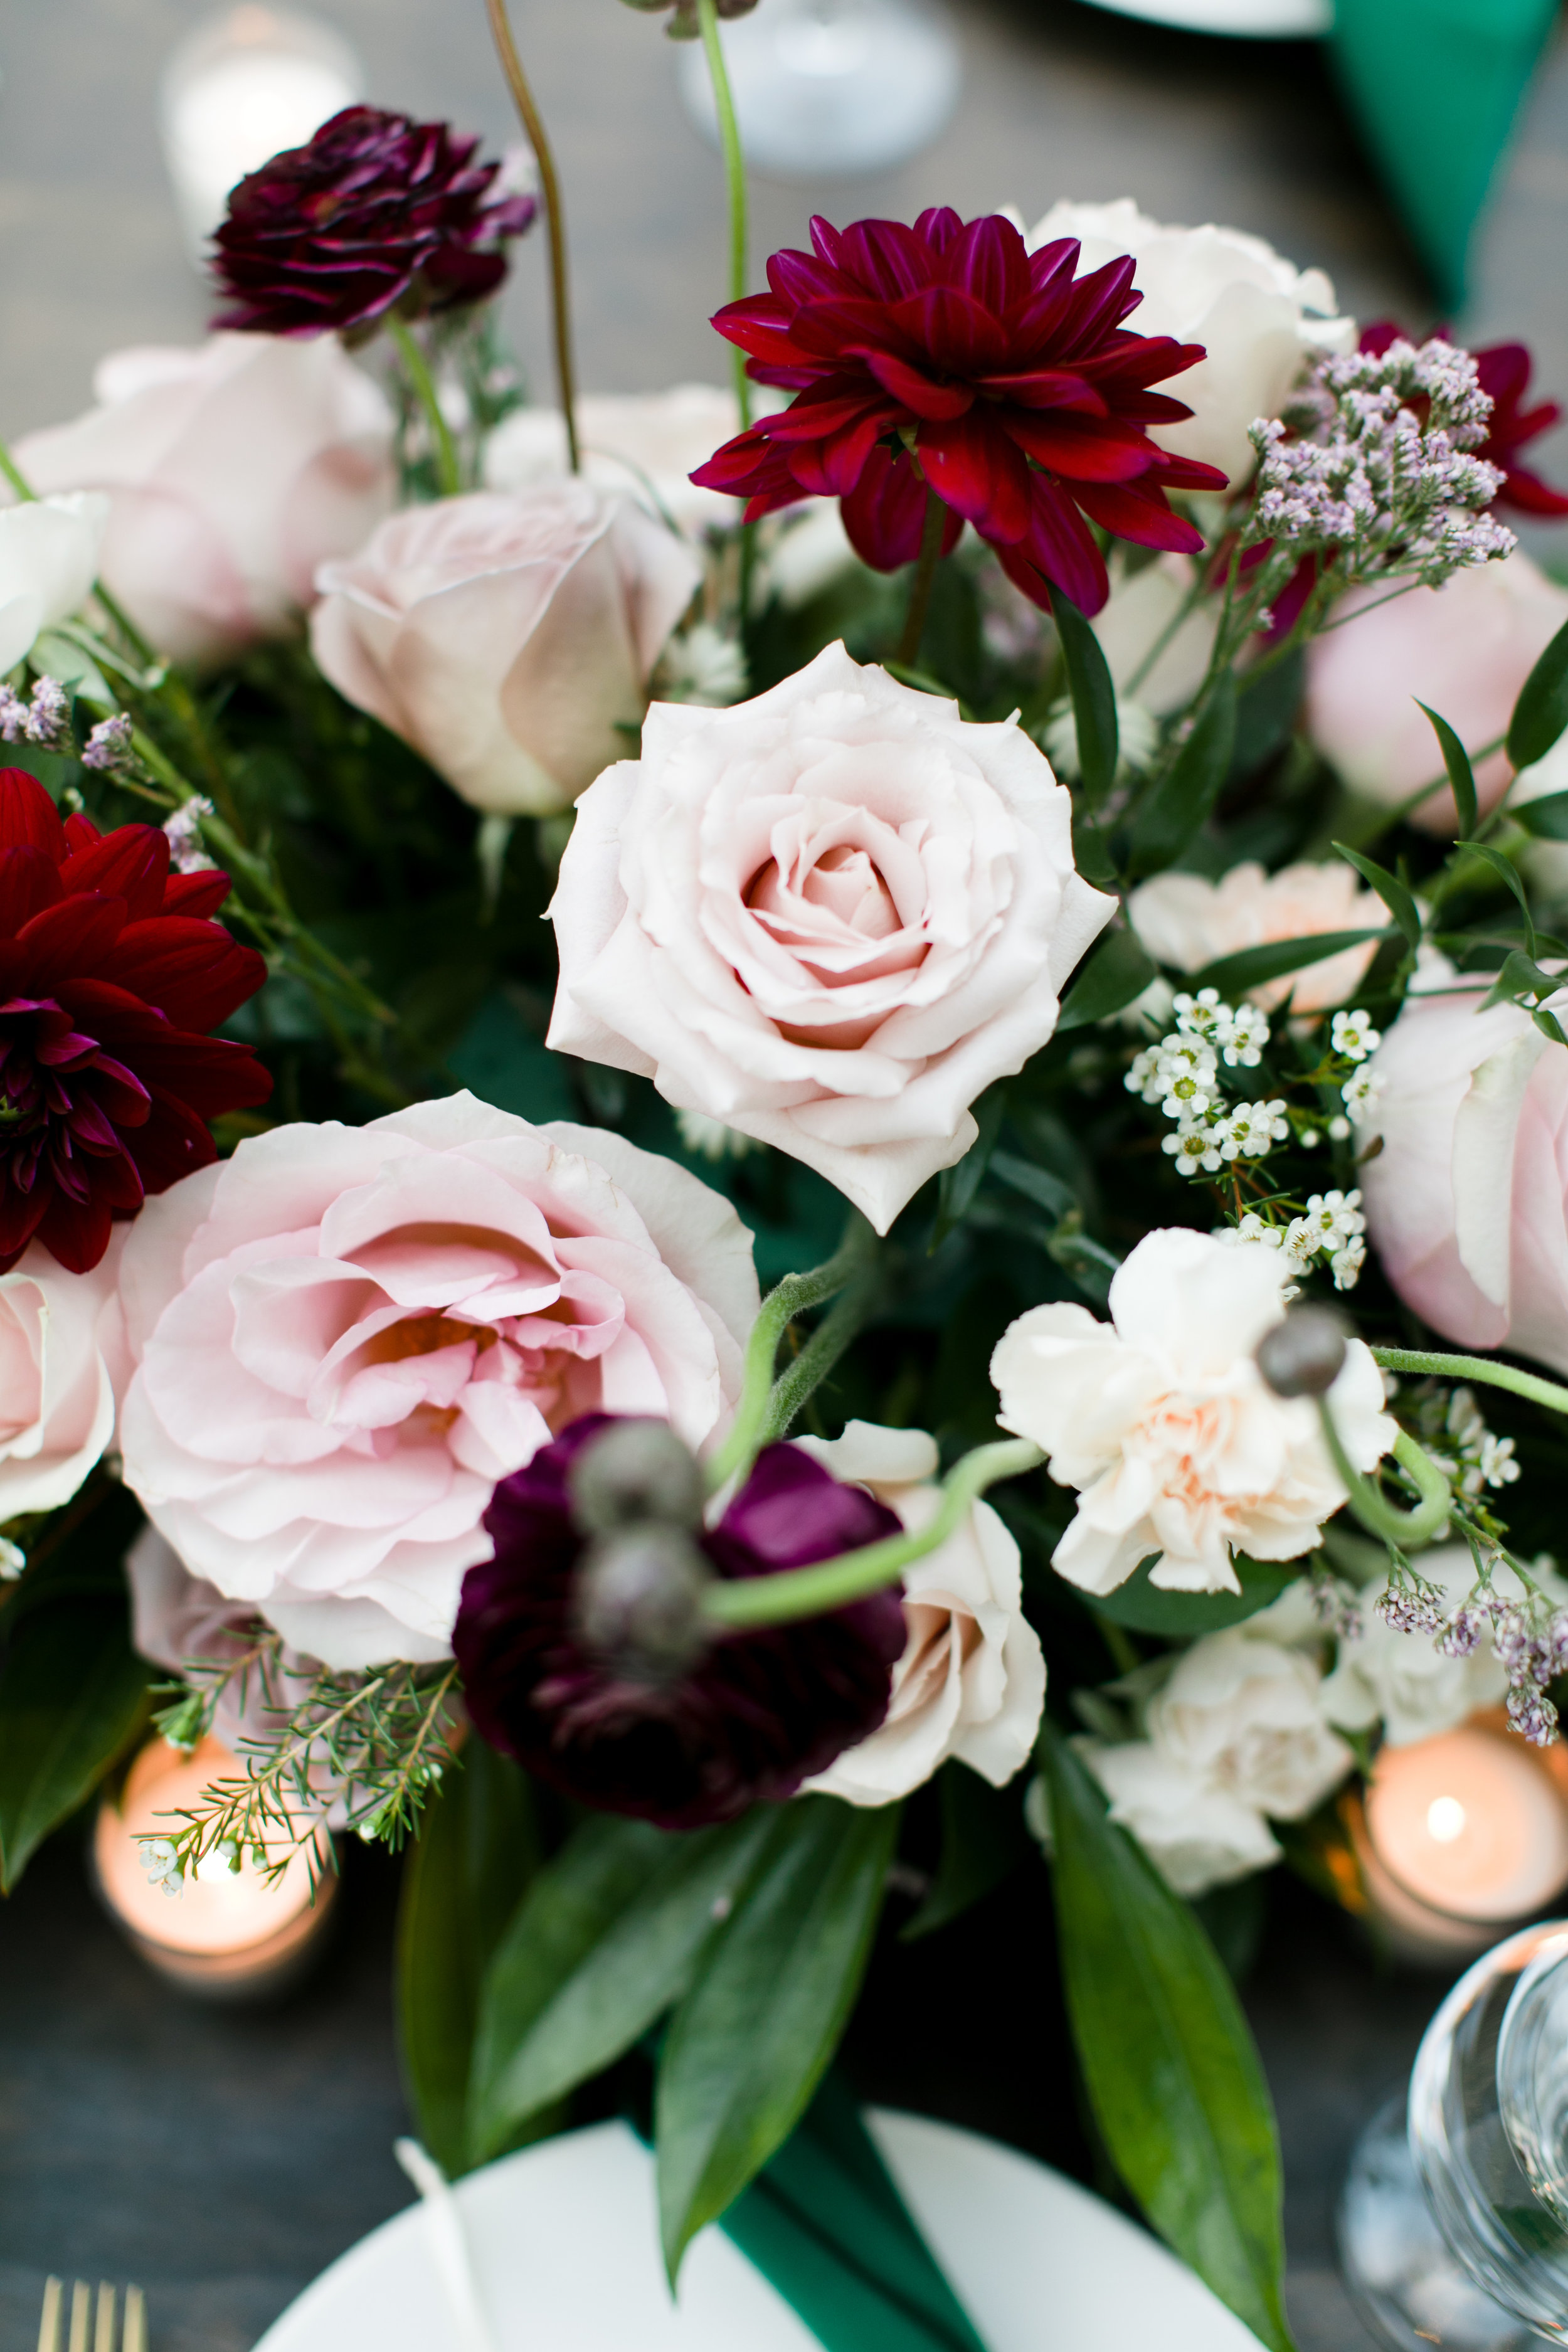 Sav-Flowers-64.jpg